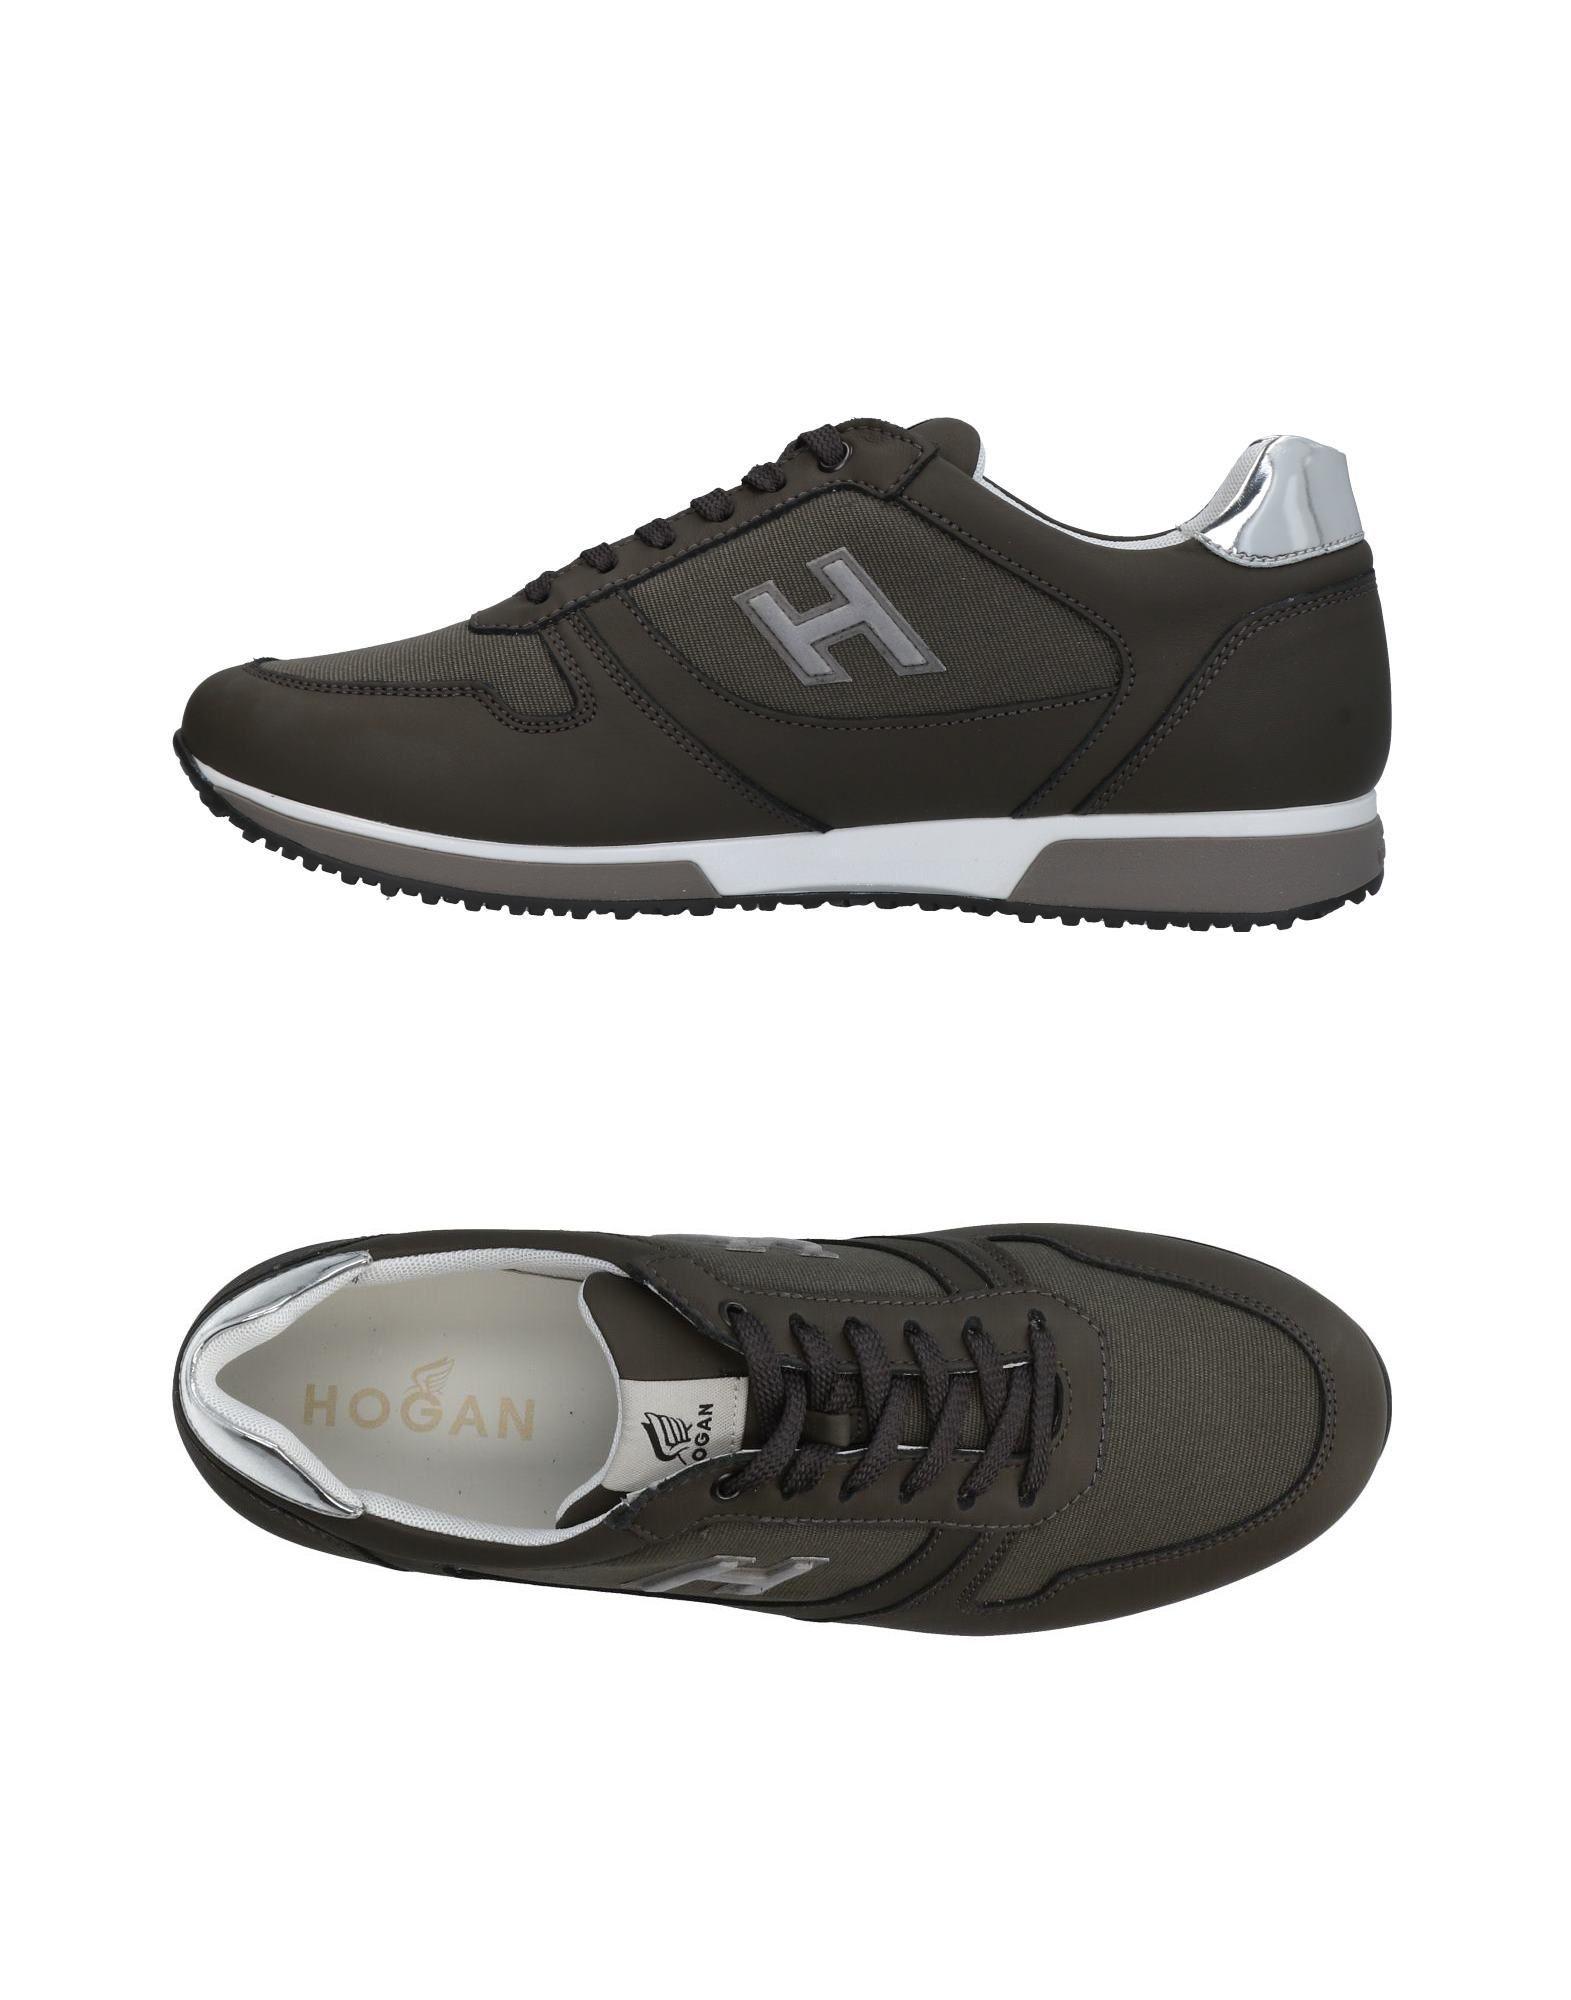 Hogan Sneakers Herren  11436388SM Gute Qualität beliebte Schuhe